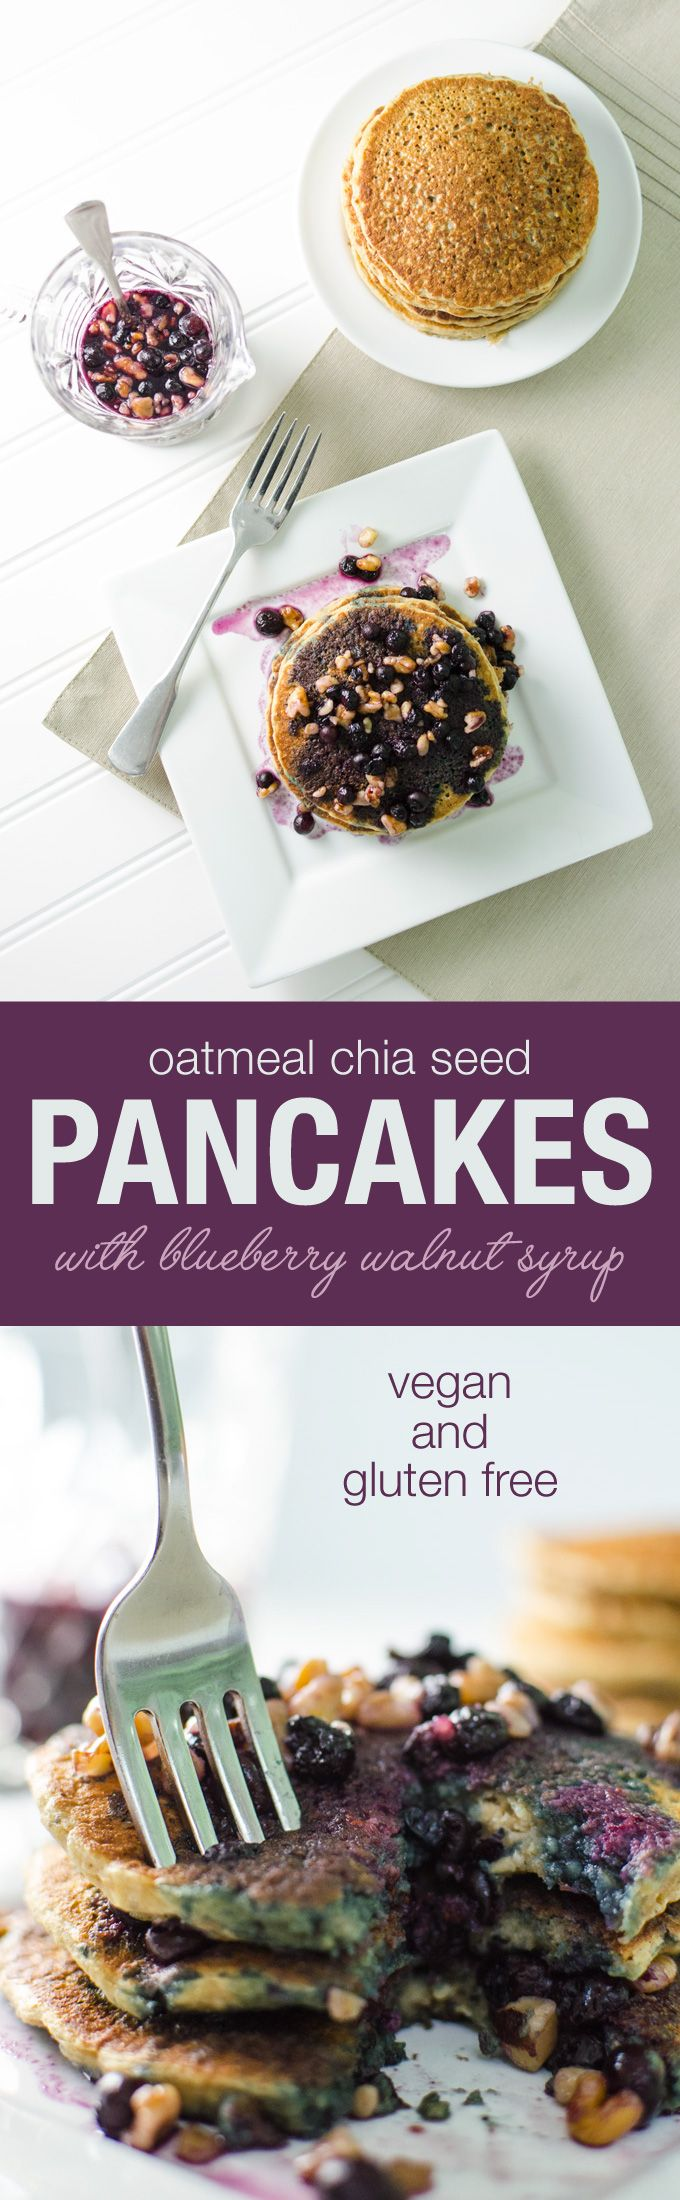 Oatmeal Chia Pancakes with blueberry walnut syrup - vegan and gluten free | Veggieprimer.com #veganbreakfast #pancakes